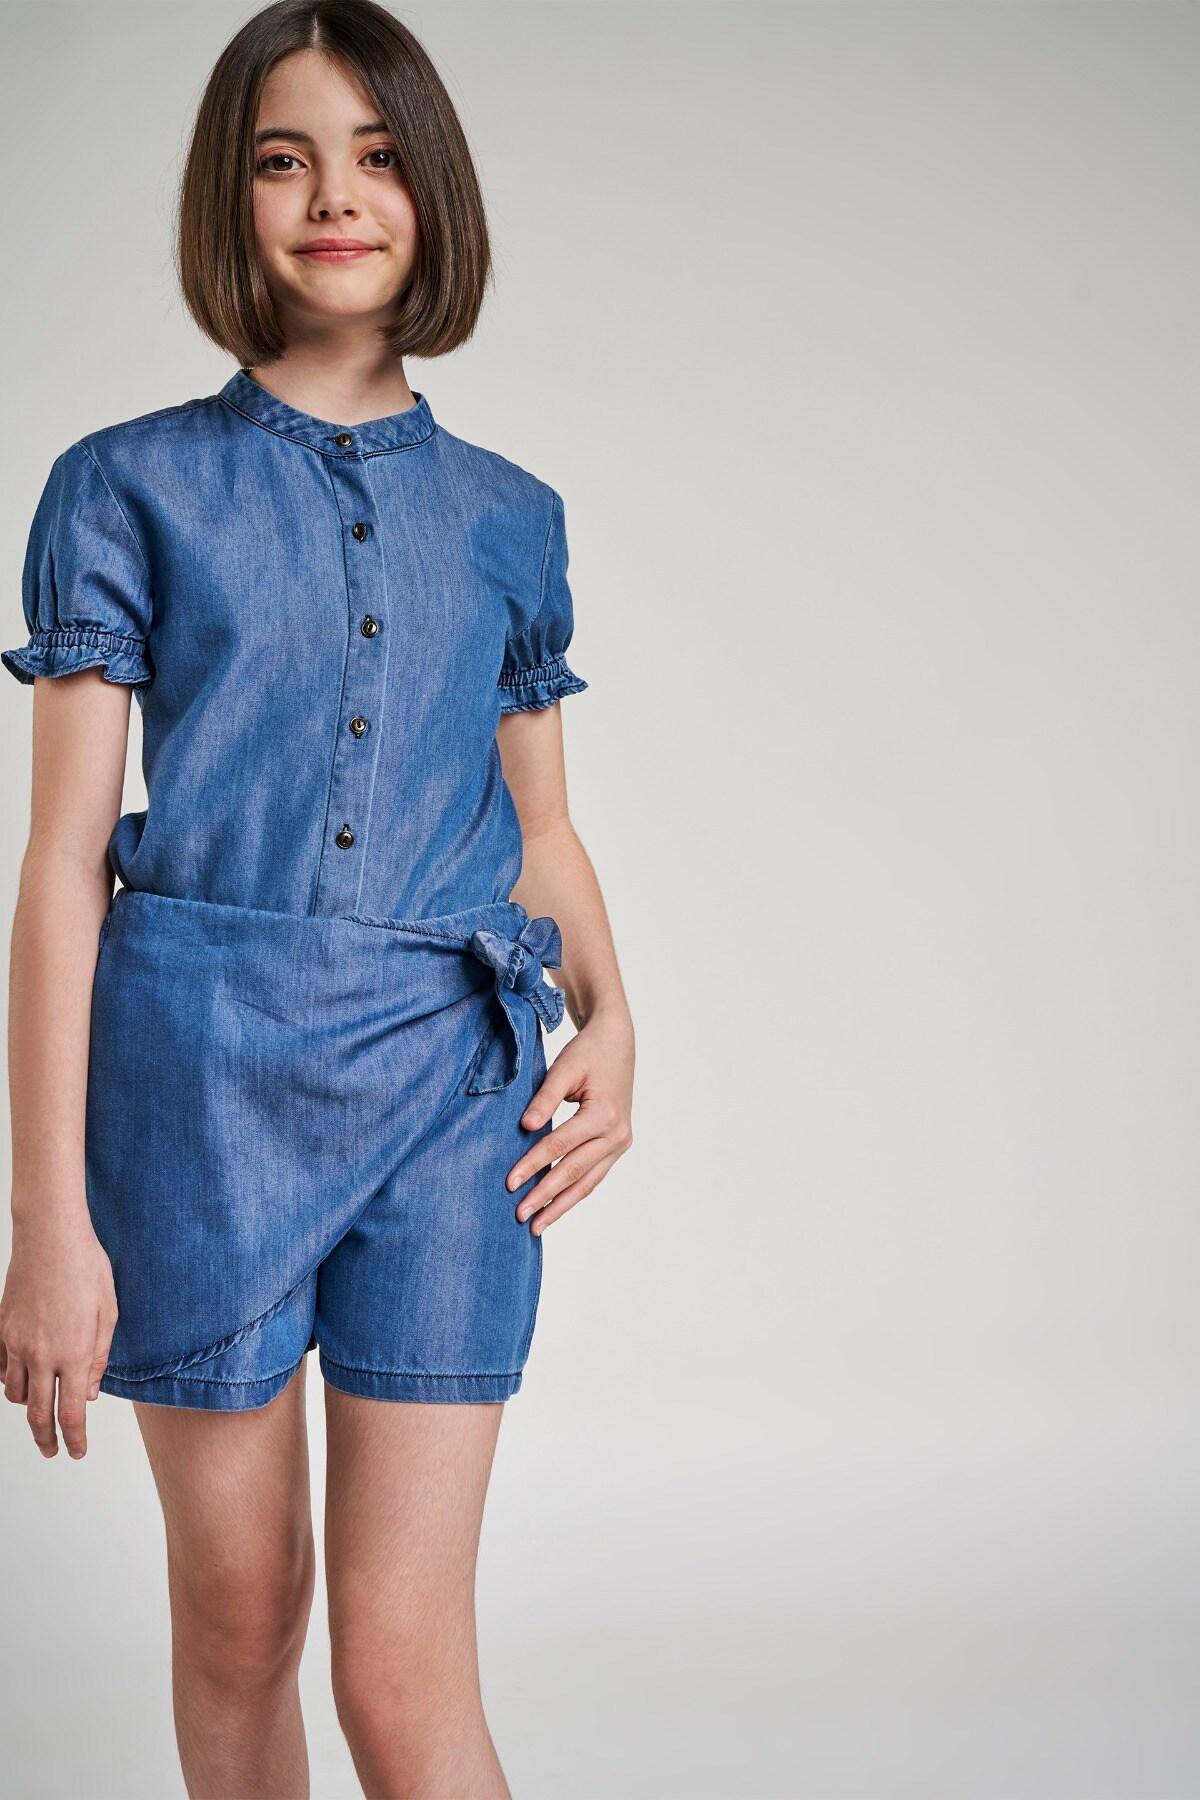 AND | Indigo Blue Solid Shirters Co-Ordinate  Set